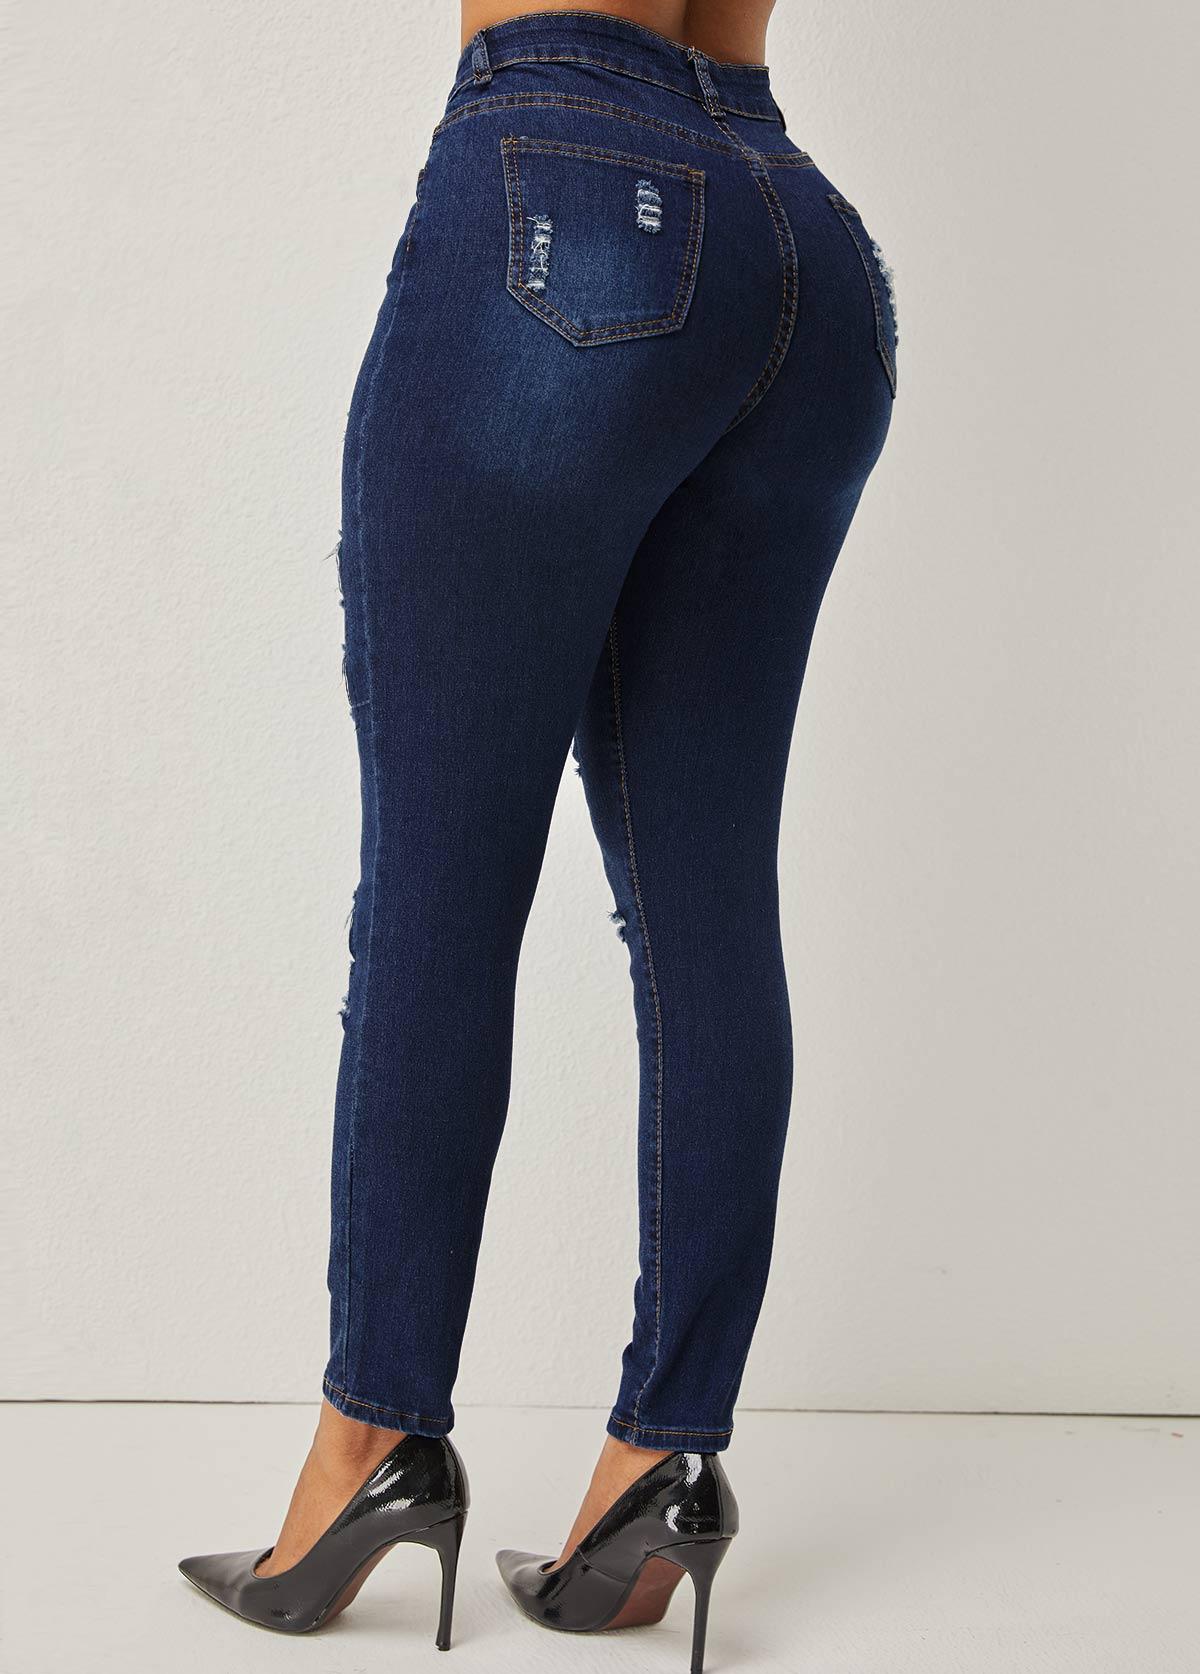 Skinny Shredded Leopard High Waist Jeans